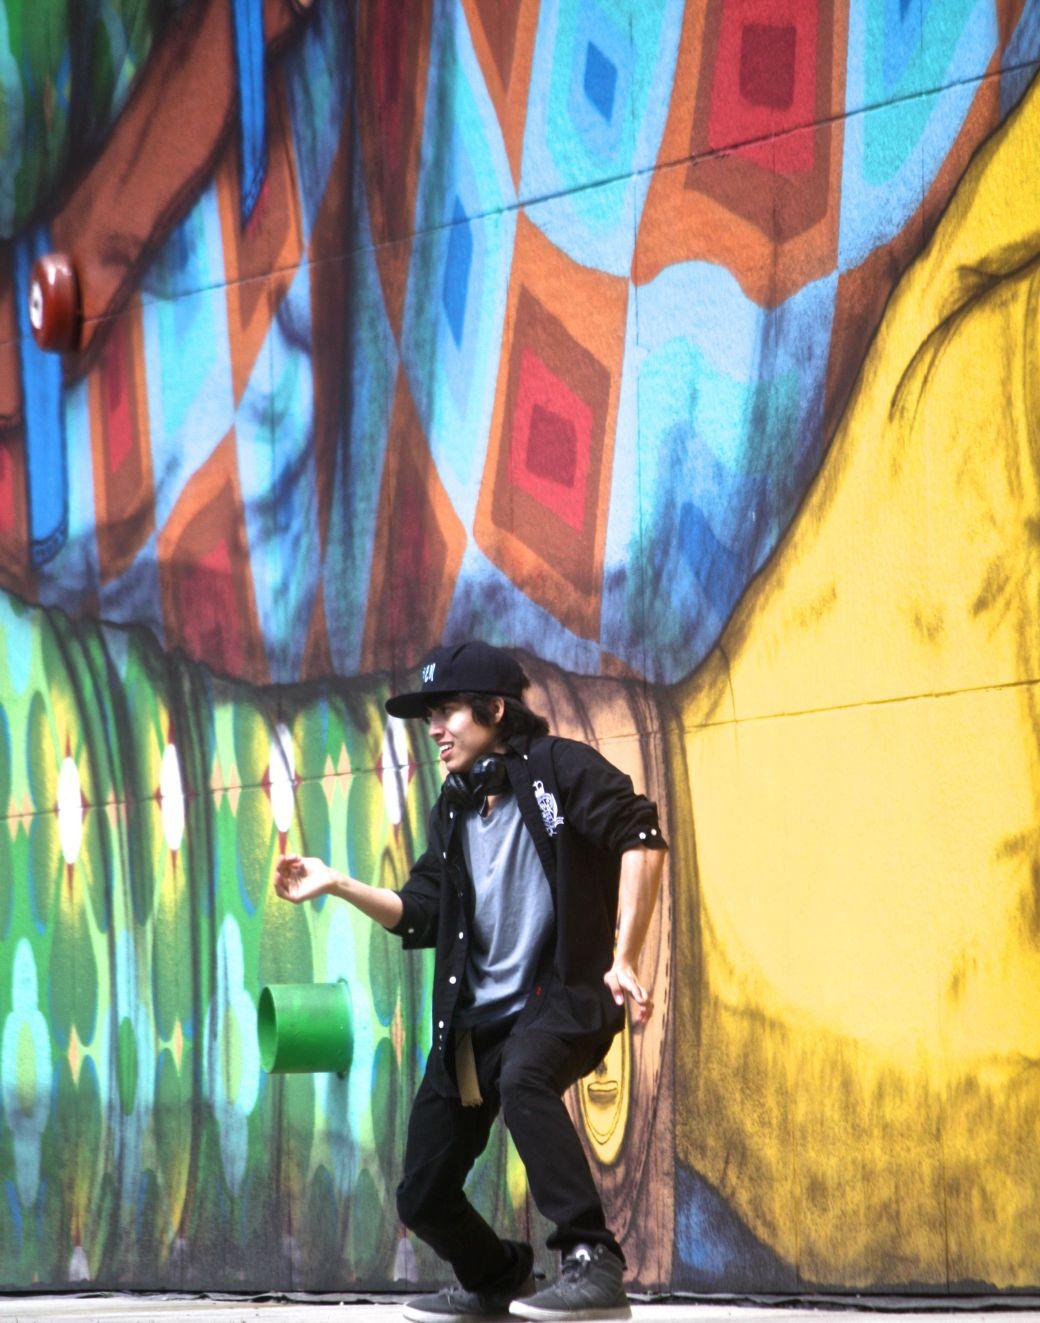 boston greenway os gemeos mural man performing 2